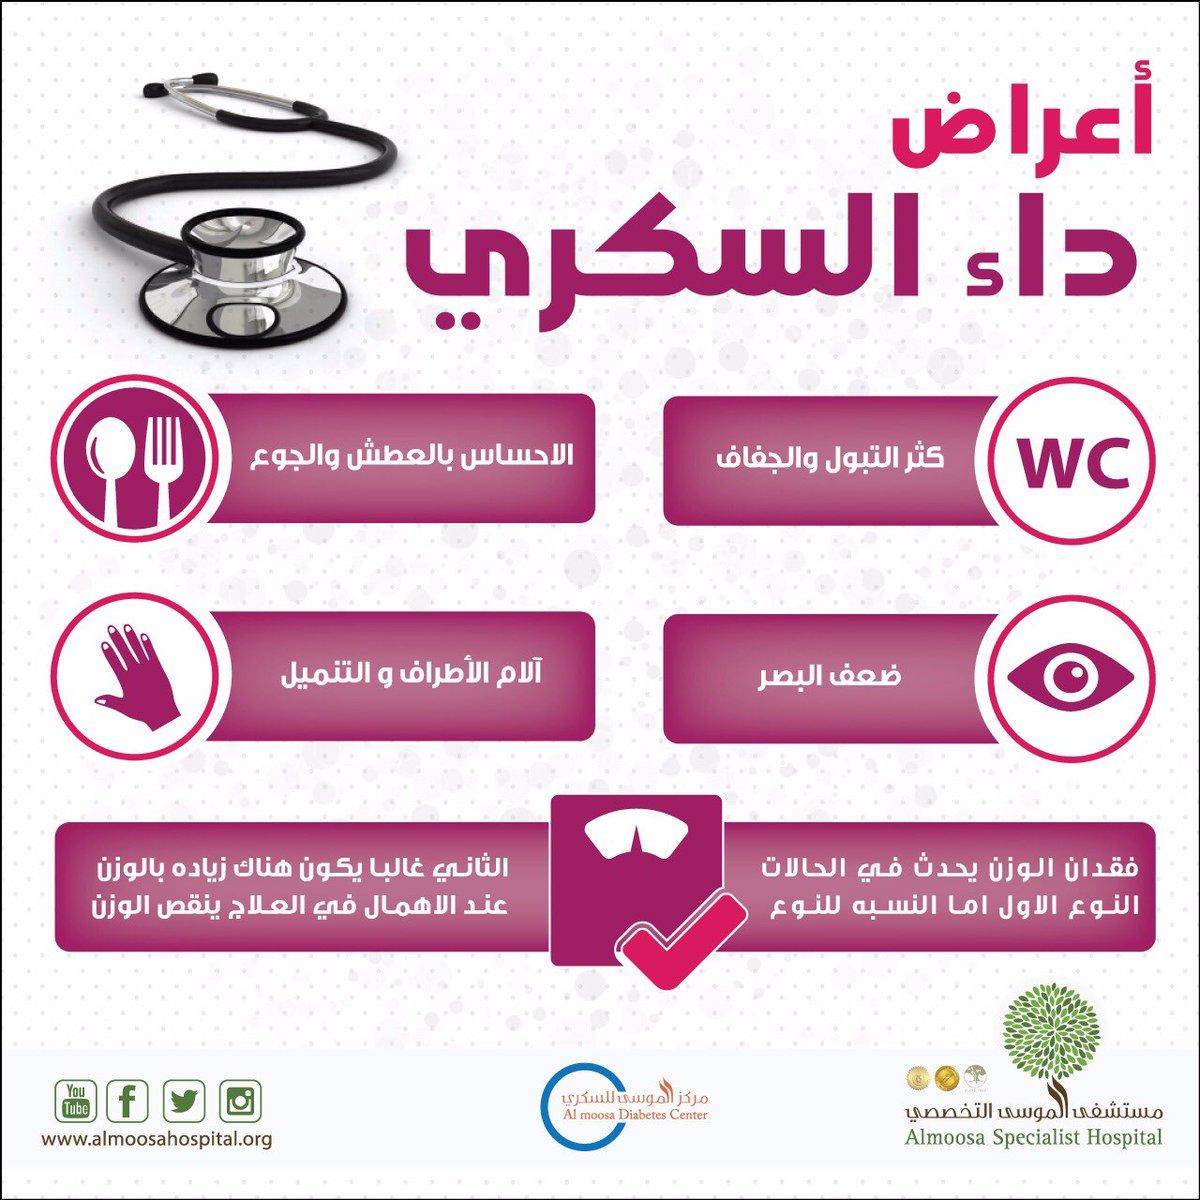 #WorldDiabetesDay: World Diabetes Day